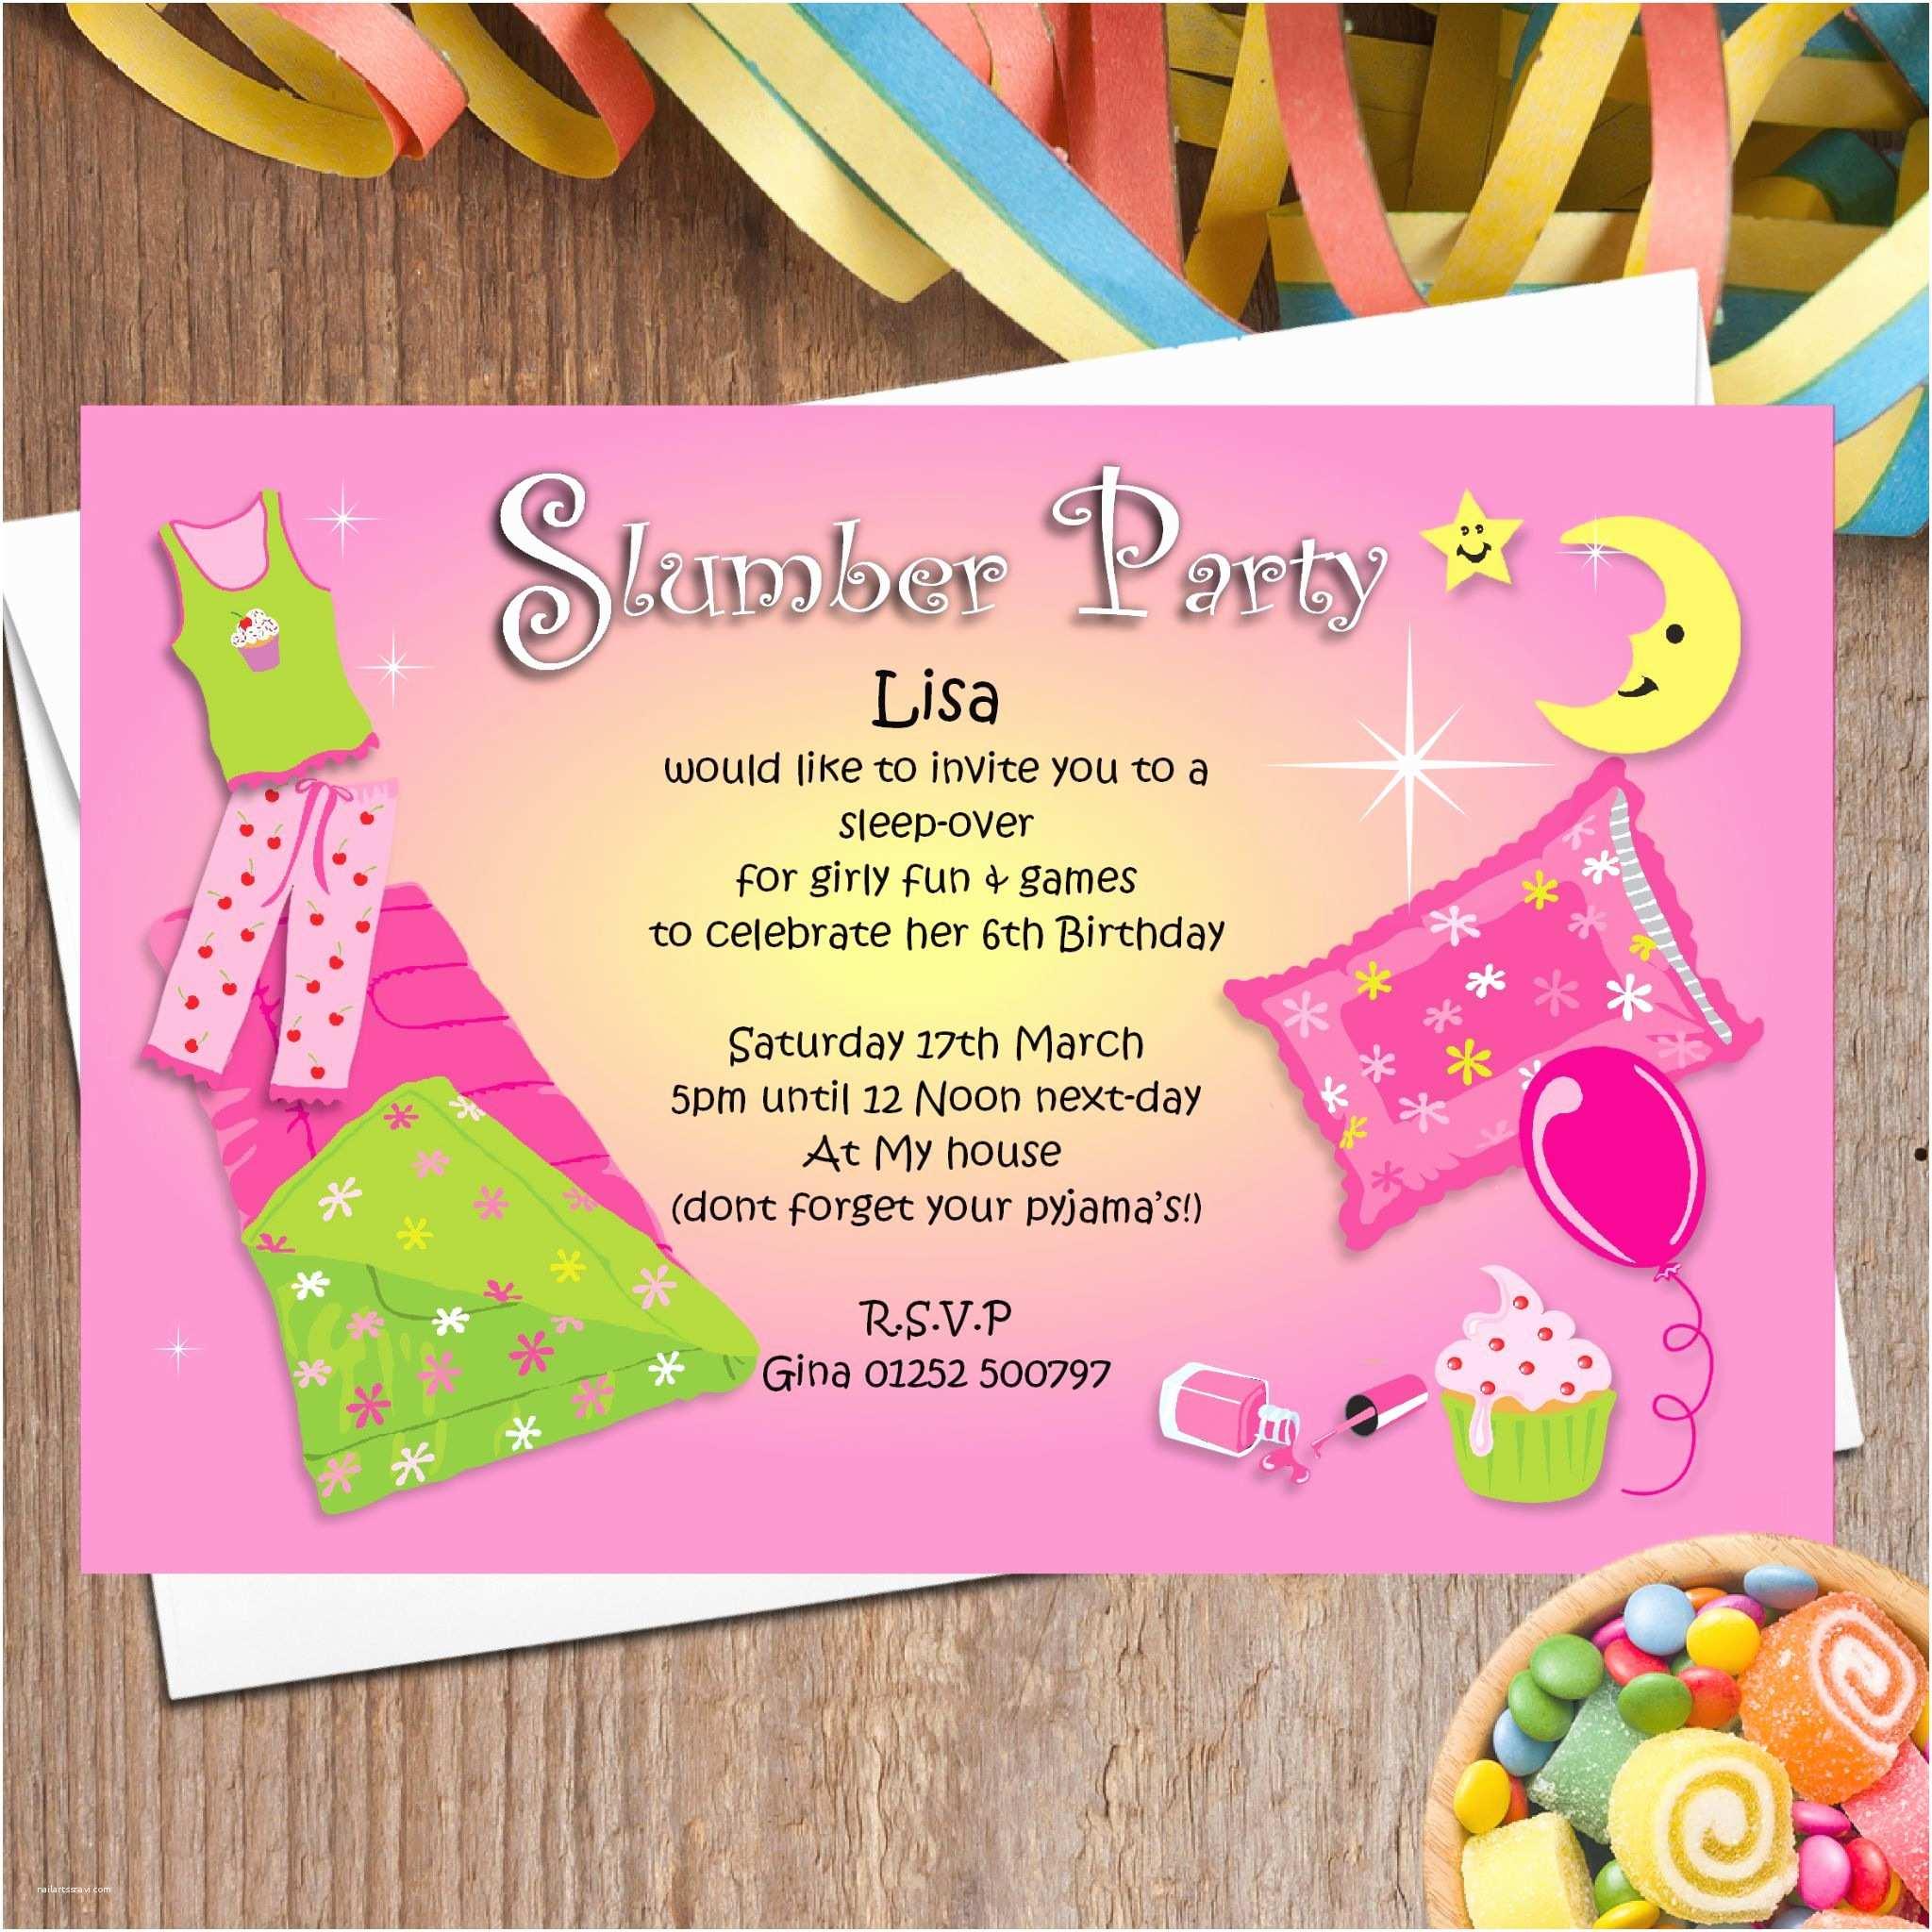 Party Invitations 10 Personalised Pyjama Sleep Over Party Invitations N45